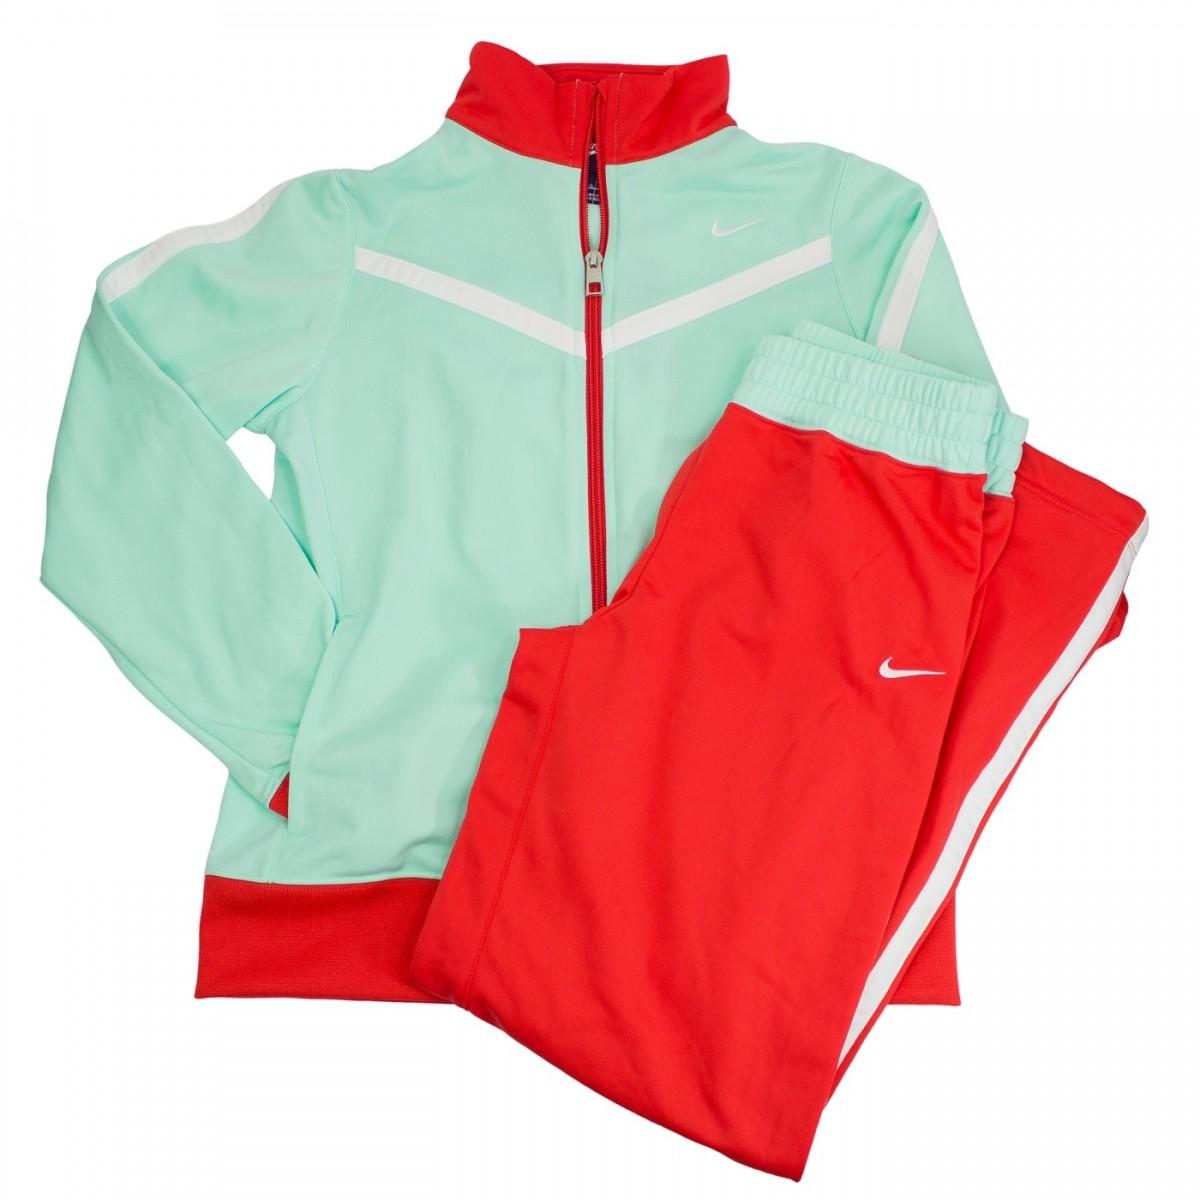 b4e79c99f5 Bizz Store - Agasalho Infantil Feminino Nike Esportivo